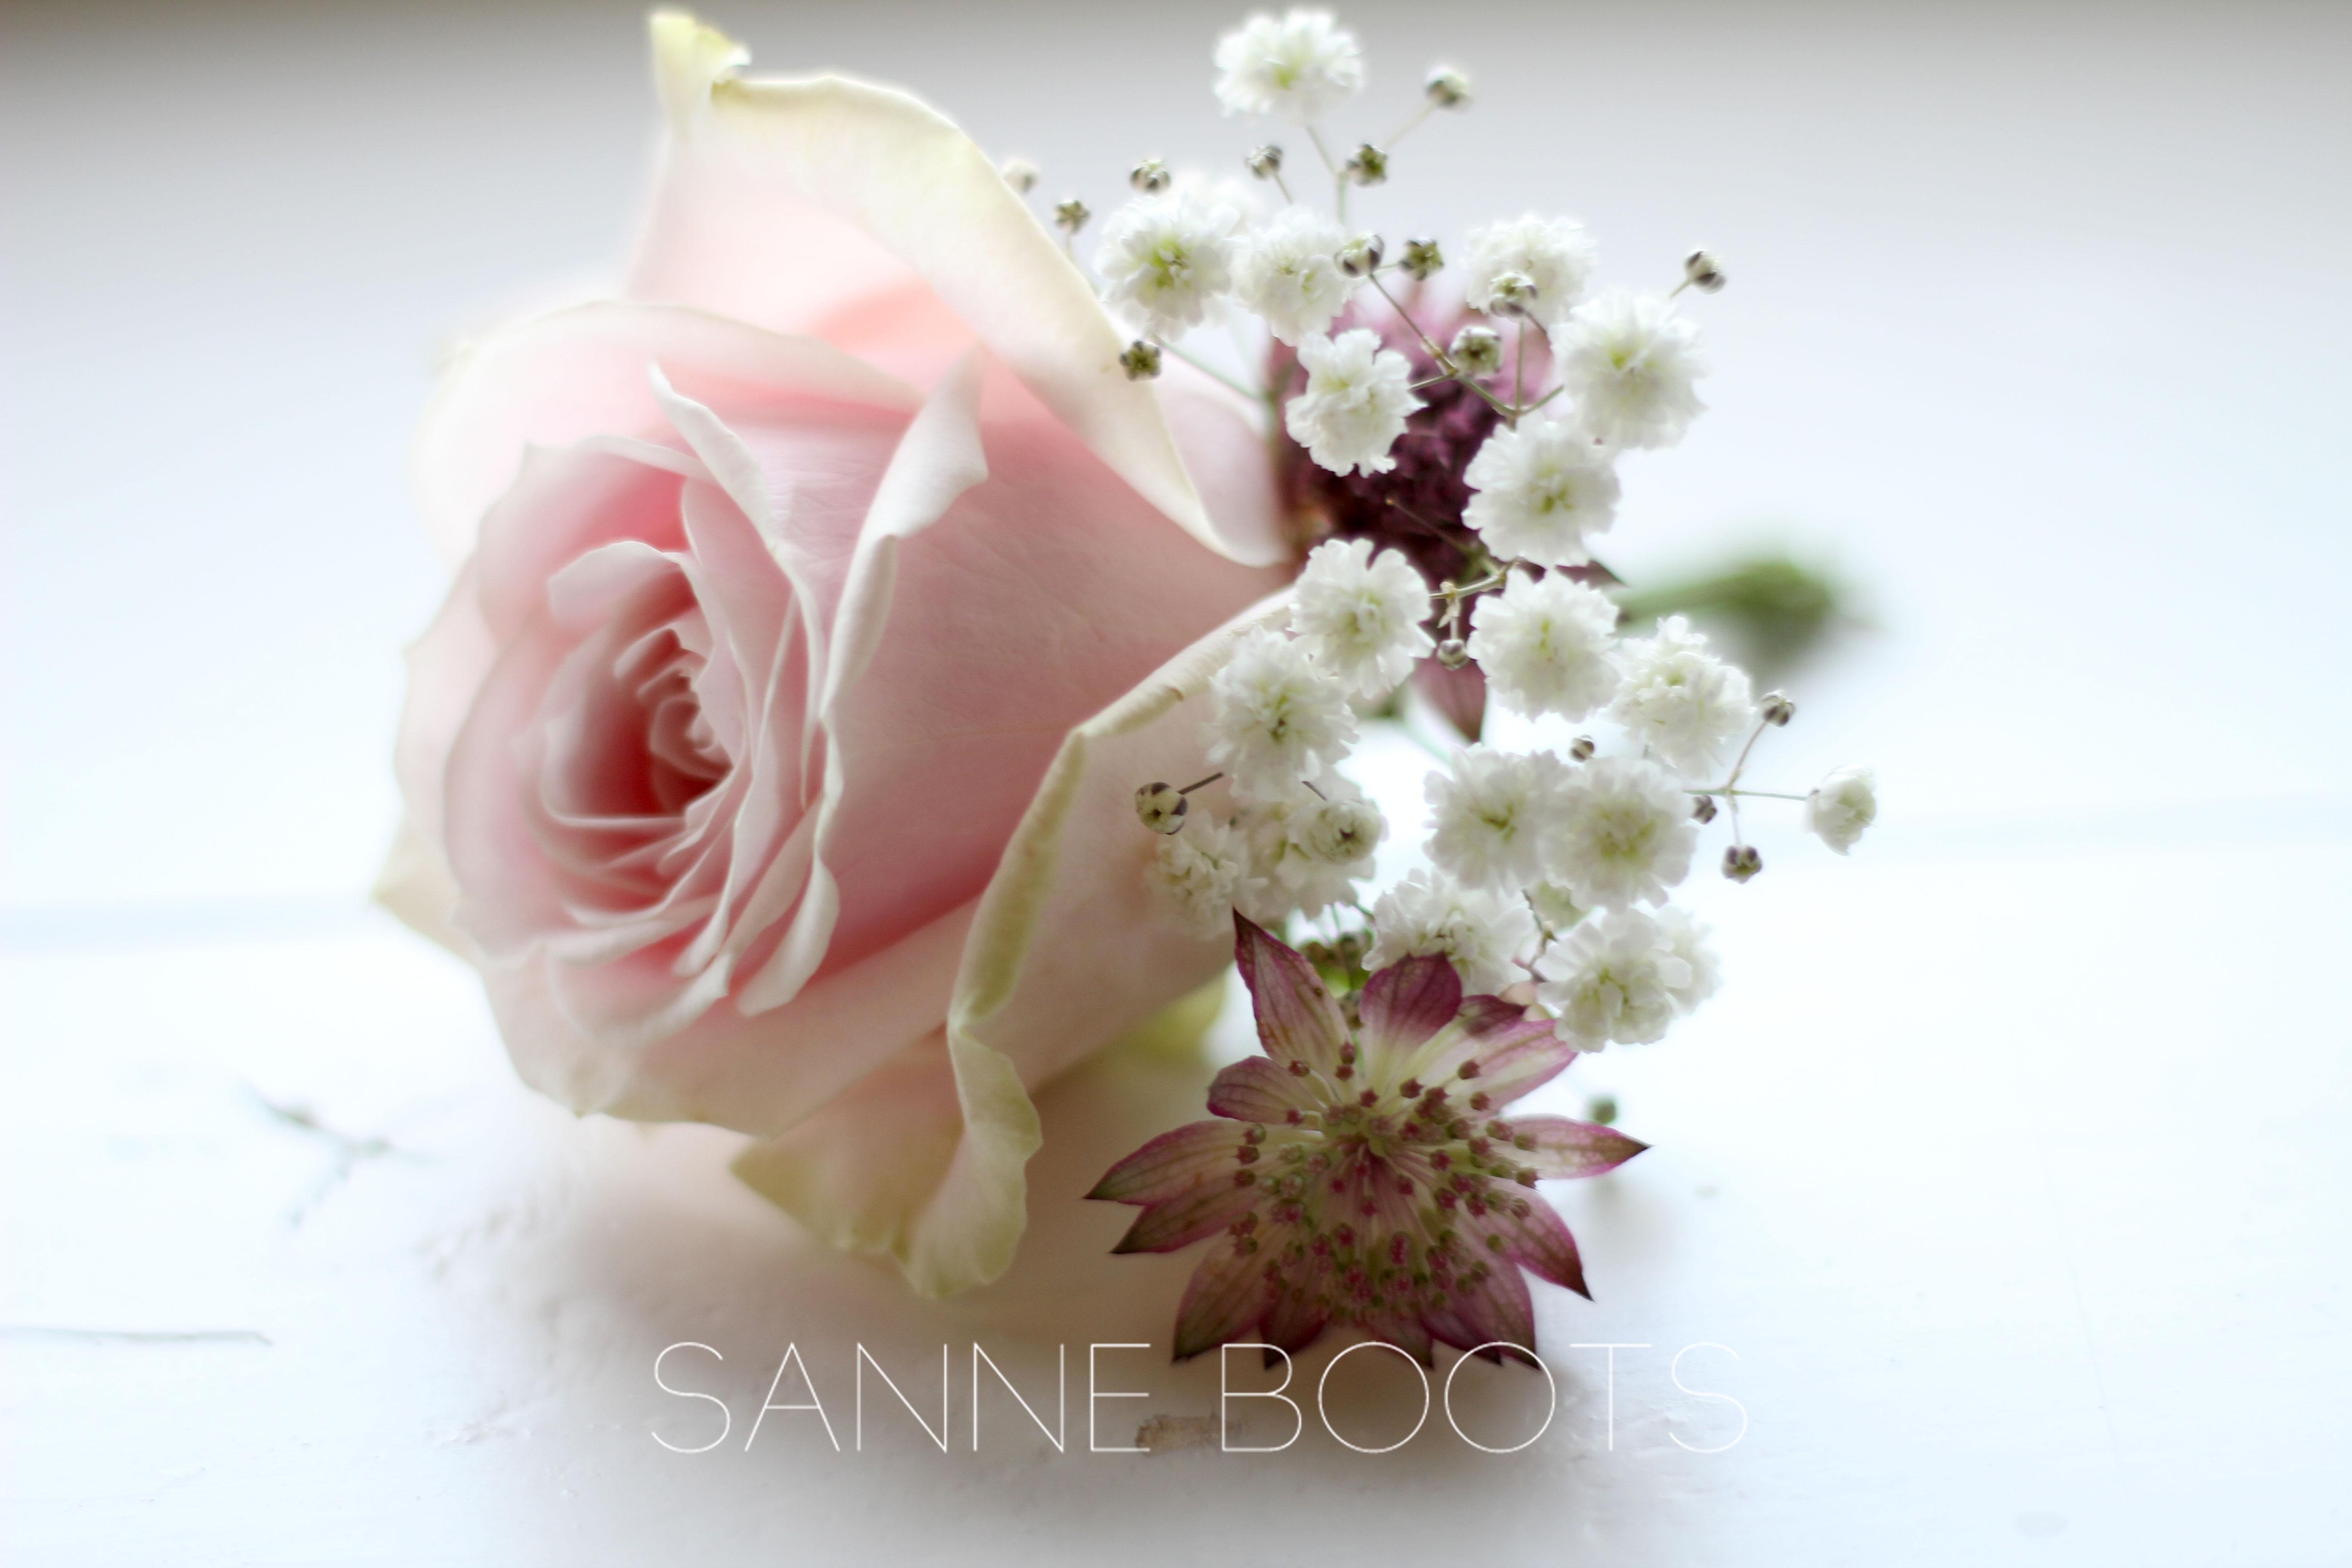 Corsage | Romantisch roze. Sanne Boots, Utrecht